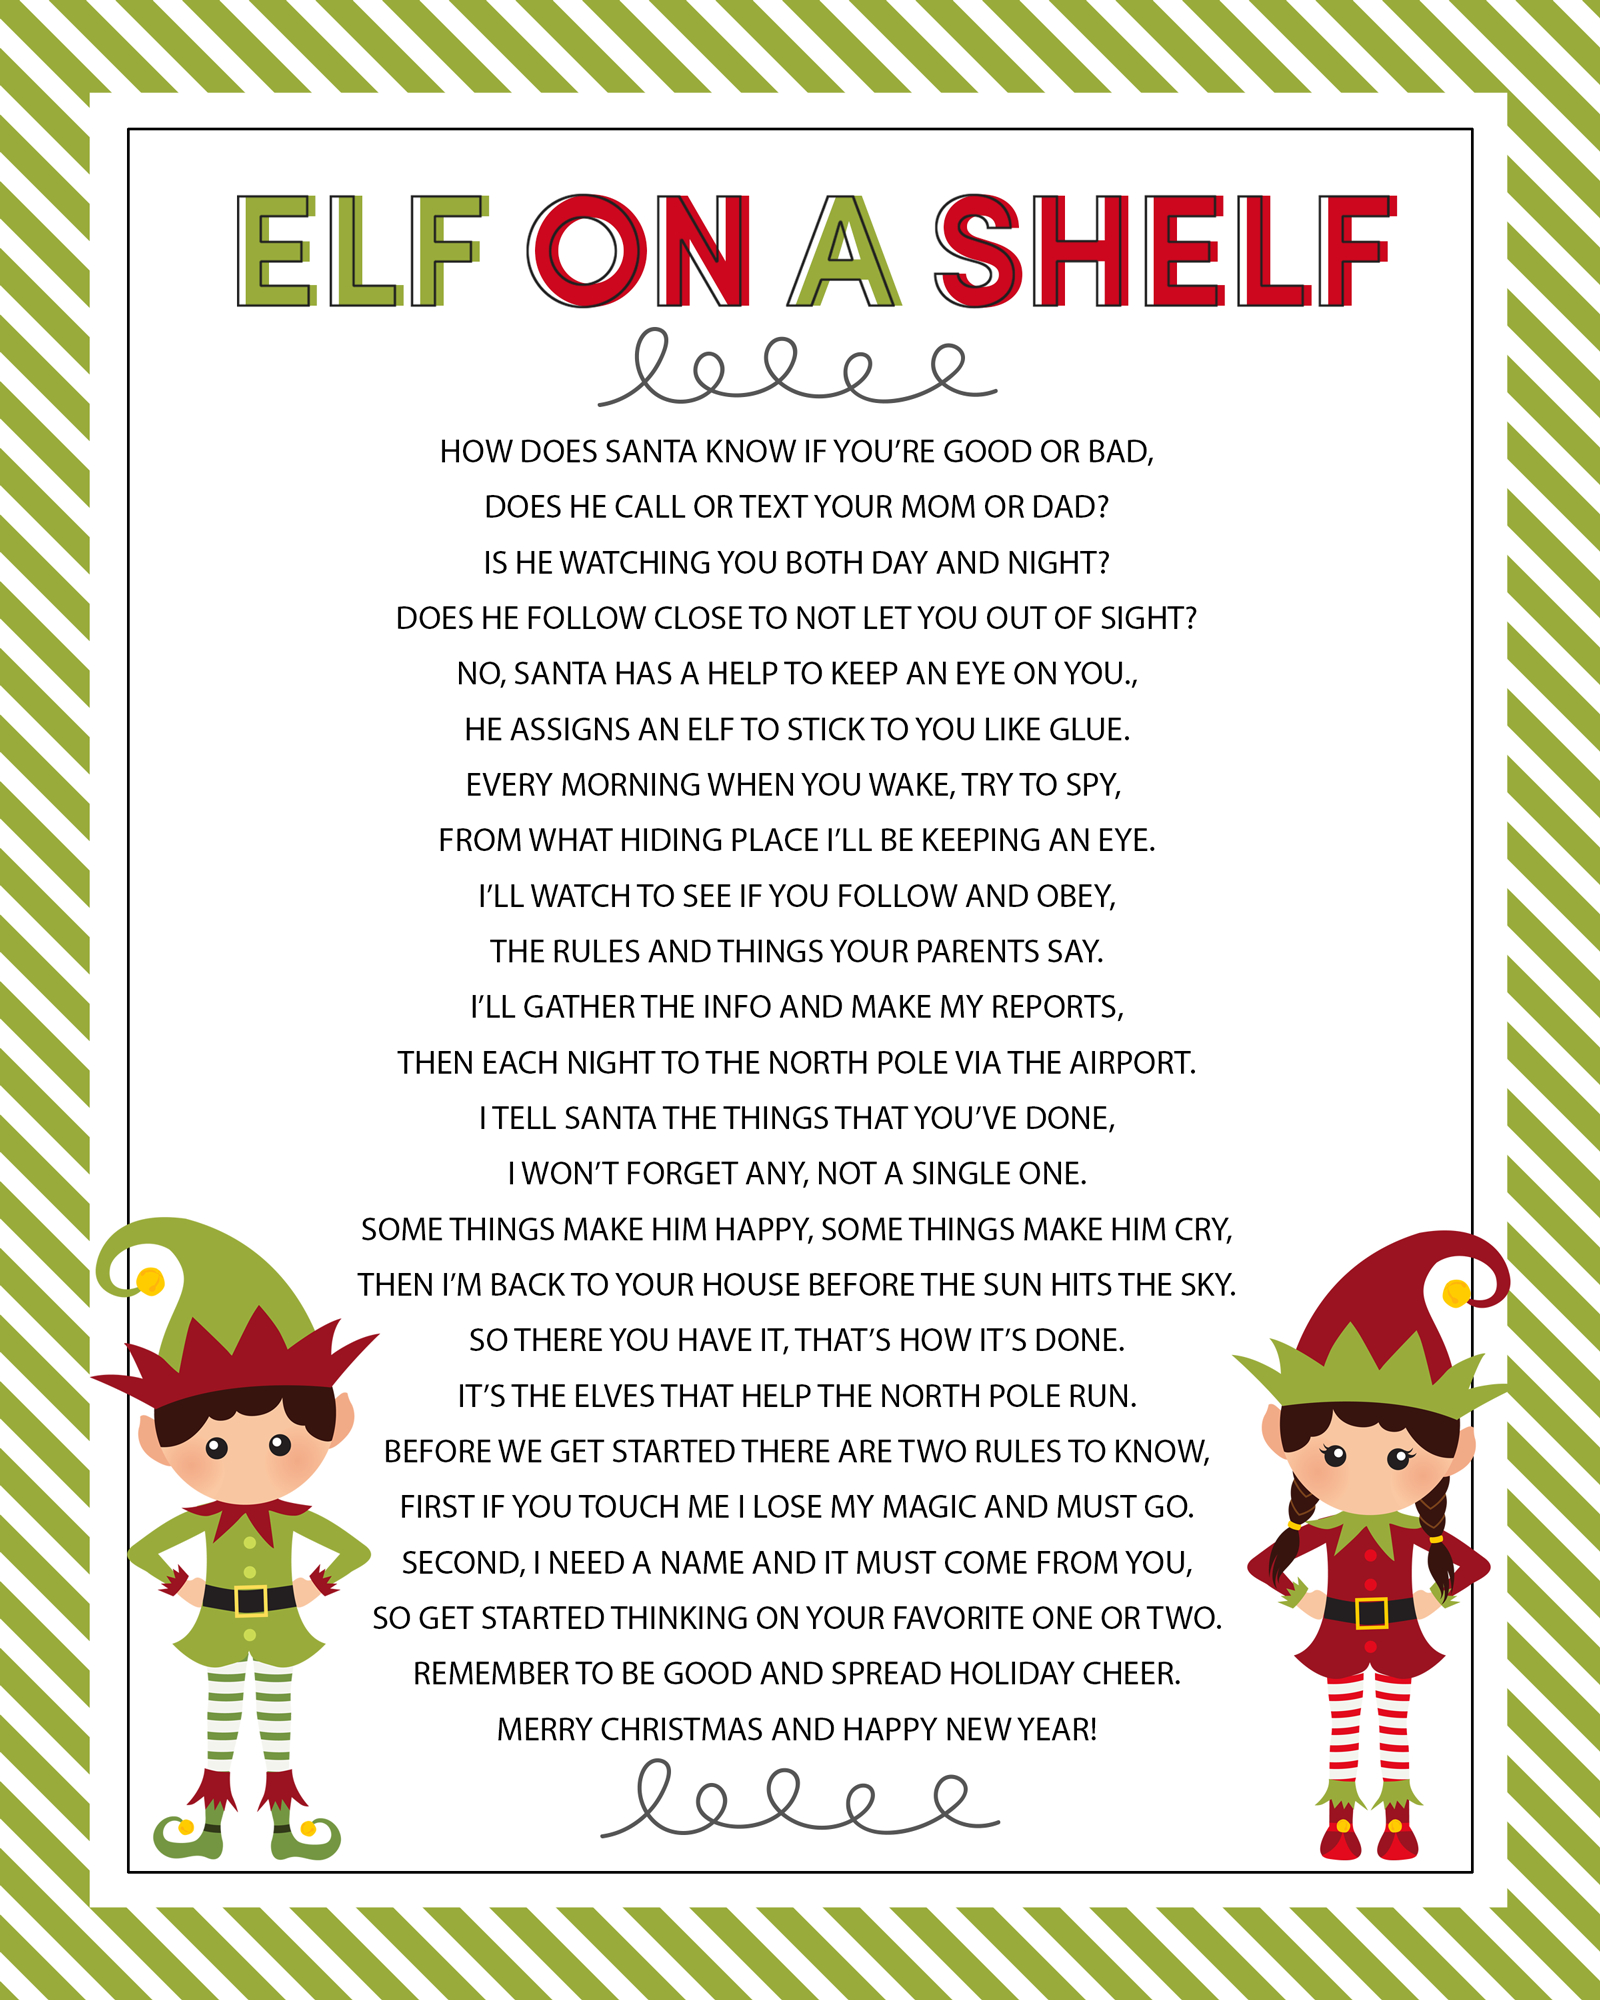 Elf On The Shelf Story - Free Printable Poem | Elf On Shelf Ideas - Free Printable Elf On The Shelf Story